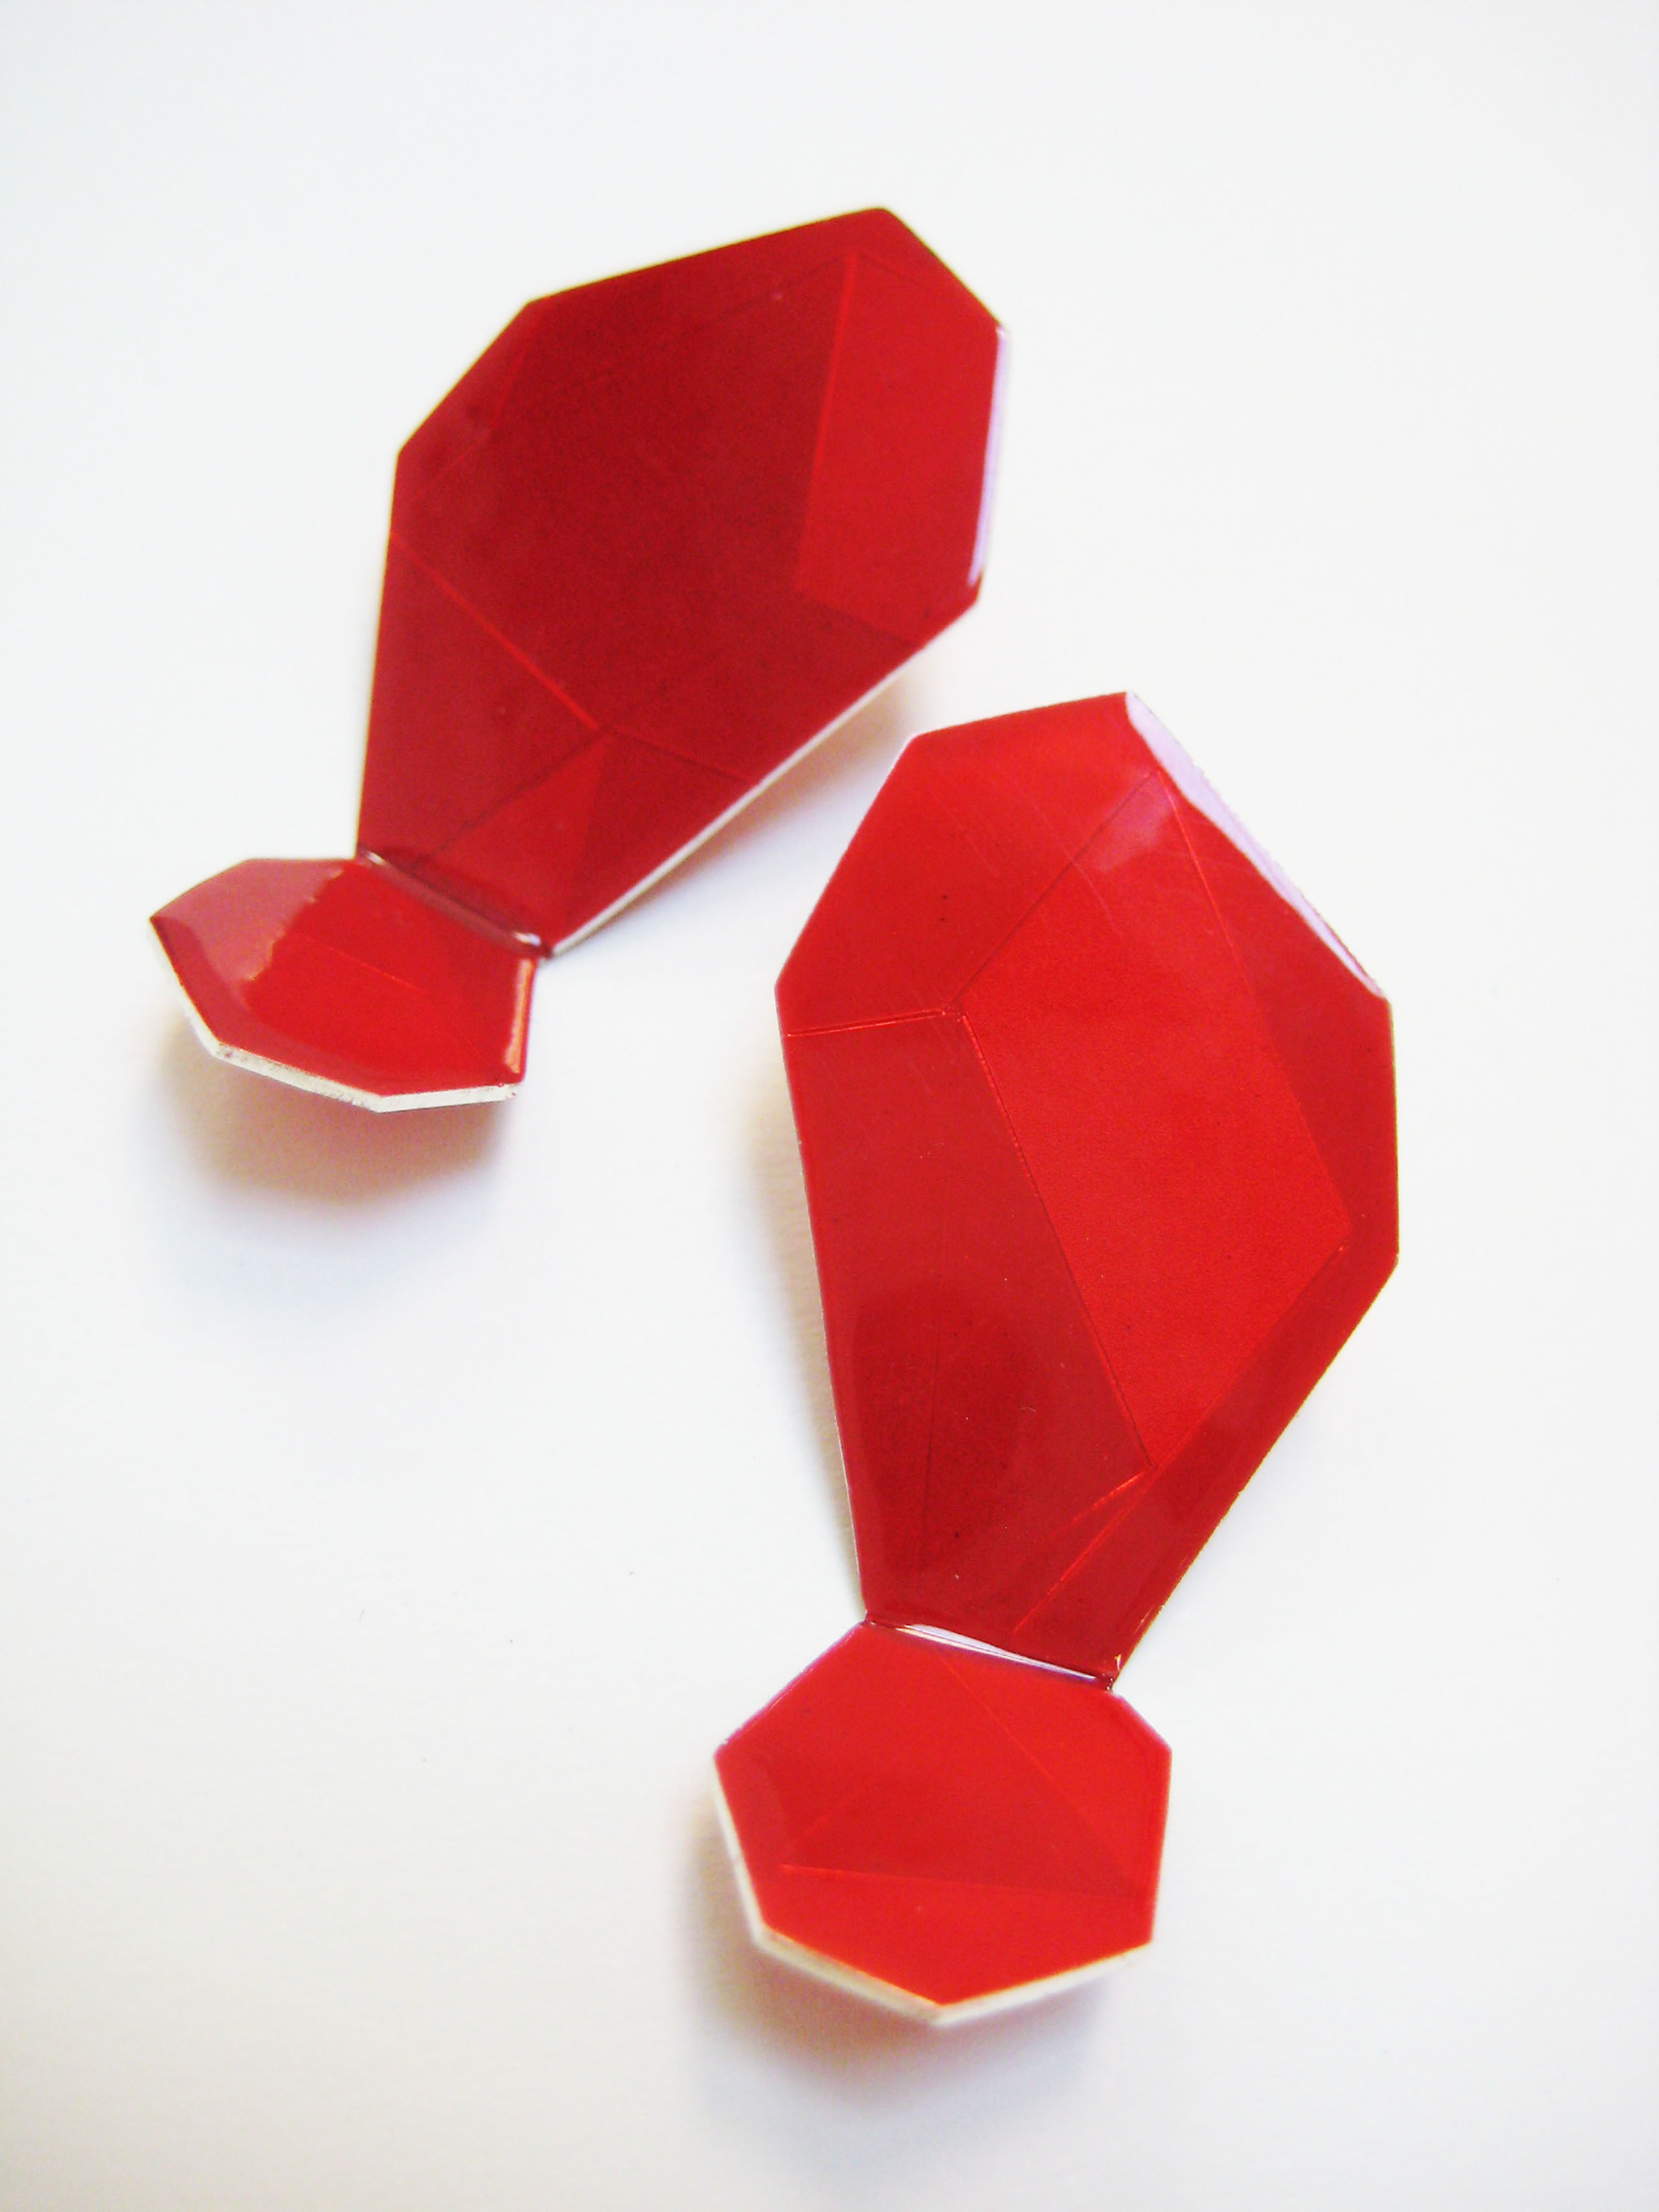 2-Large Red Ear Gems-Voegele.jpg